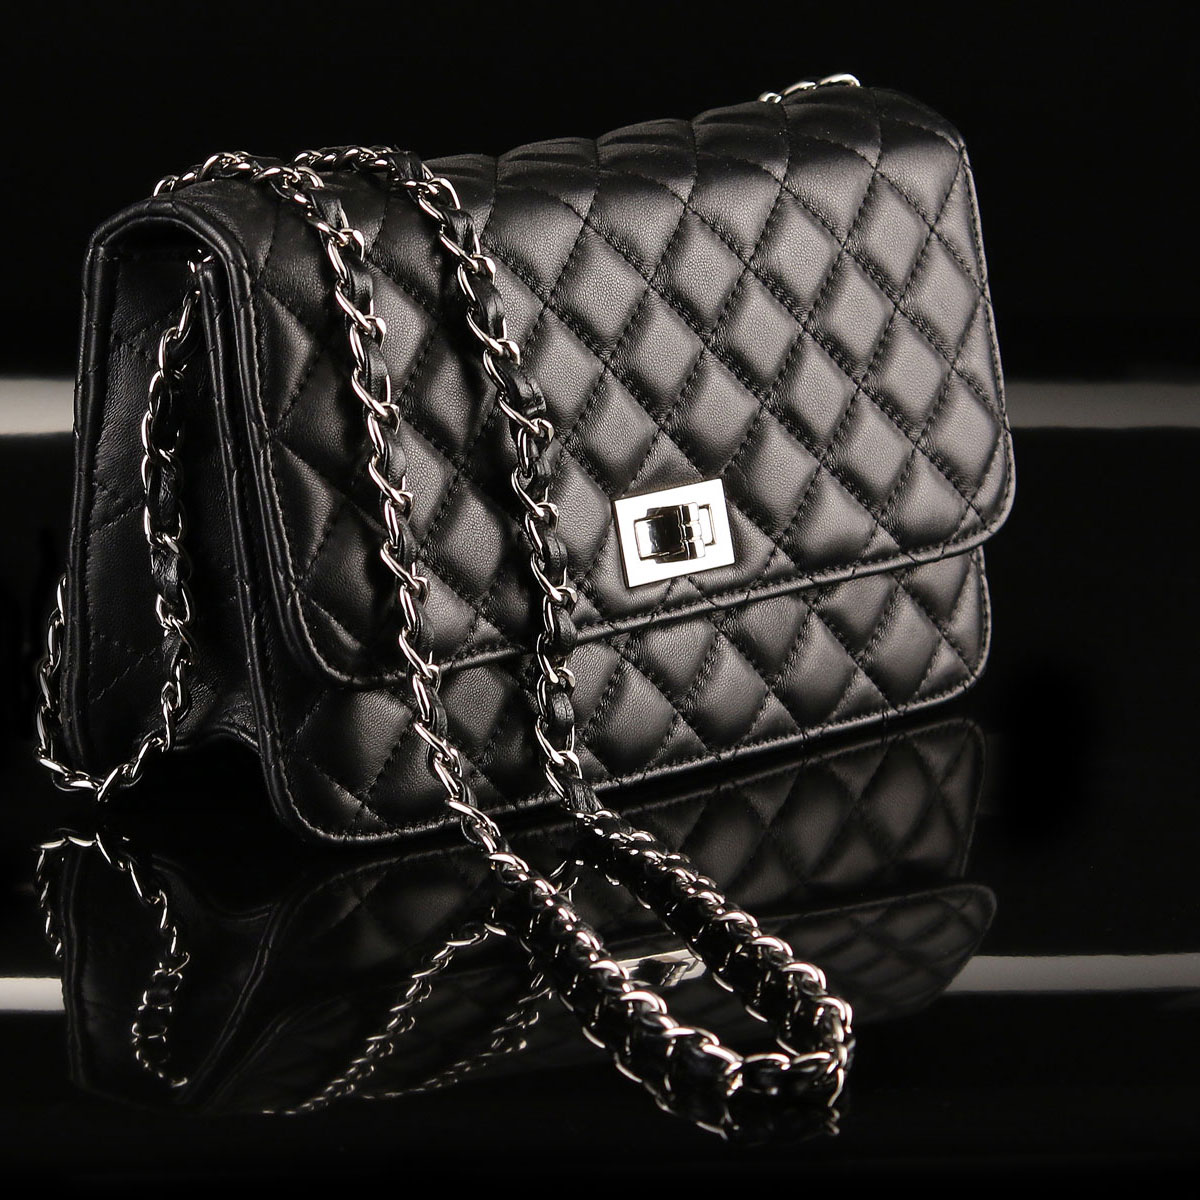 Cashs Ireland, Top Grain Leather Cooper Handbag, Black, Limited Edition